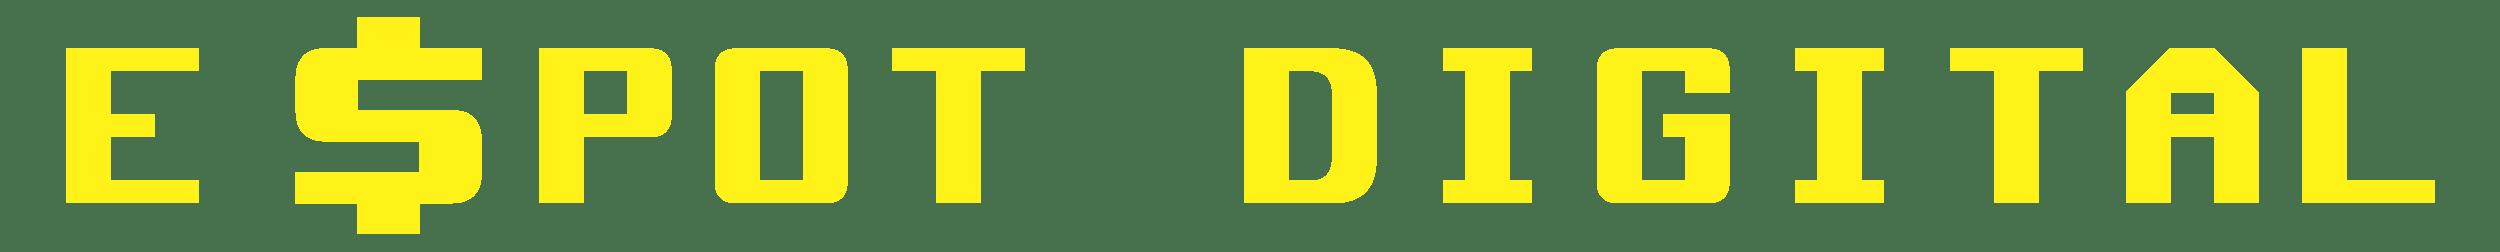 E-SPOT DIGITAL